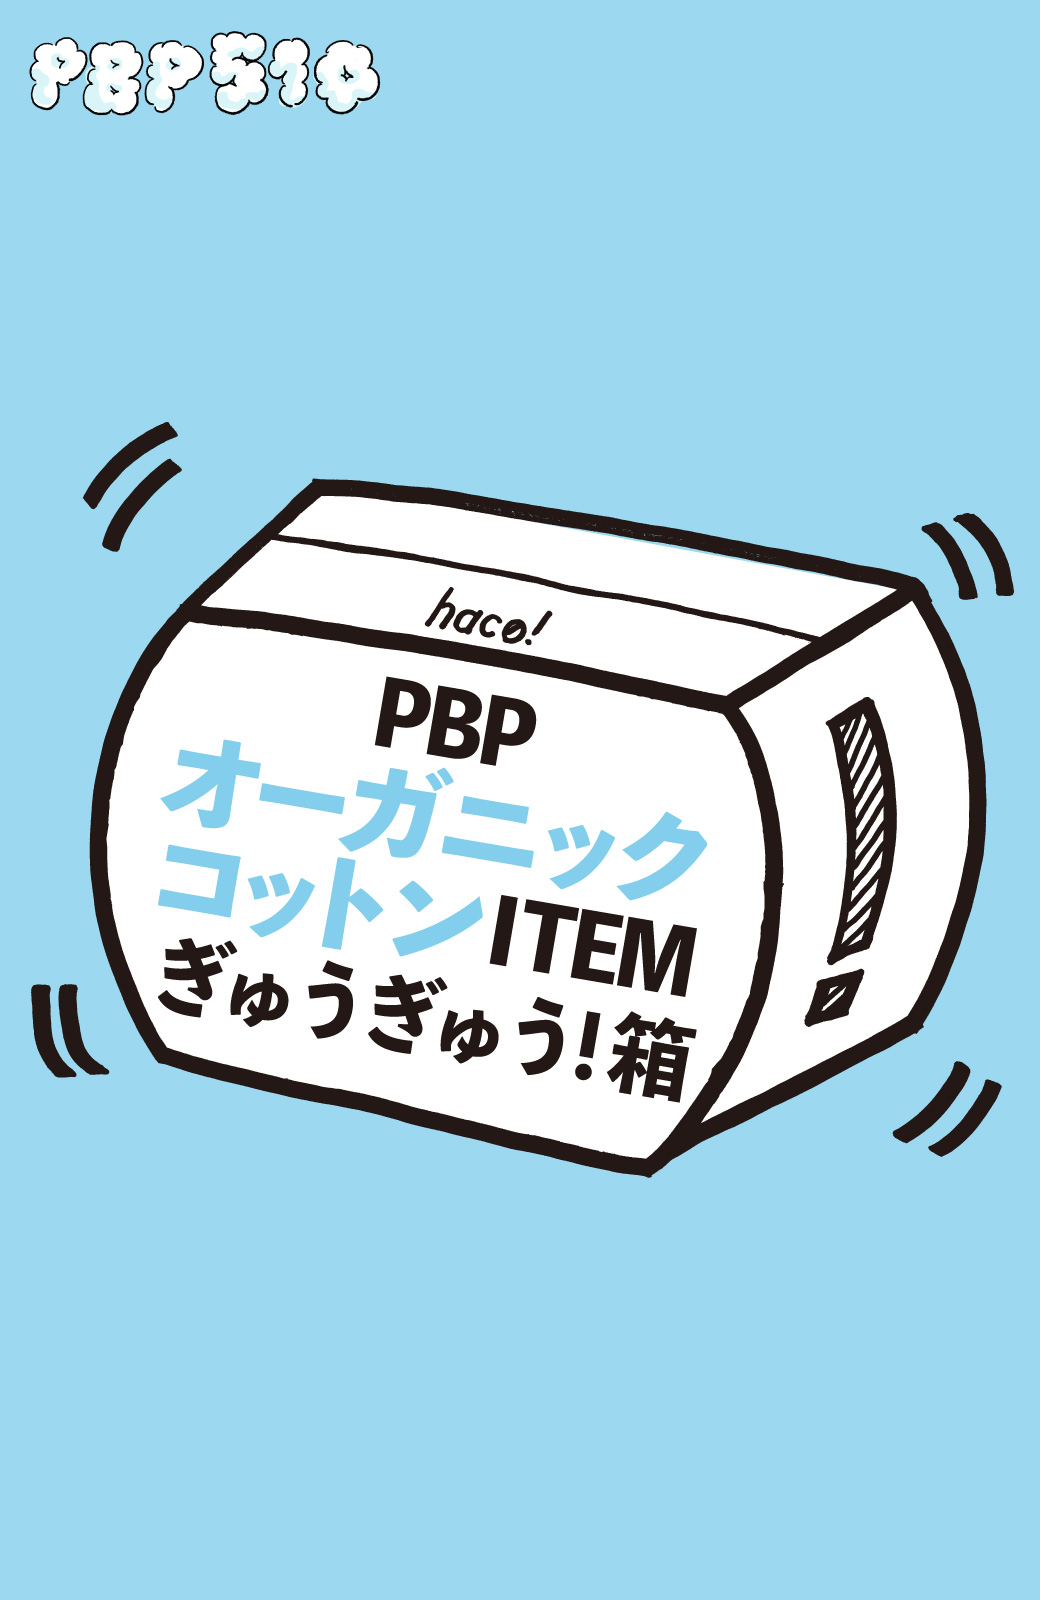 haco! 【再登場!】PBP オーガニックコットンITEM ぎゅうぎゅう!箱 <その他>の商品写真1